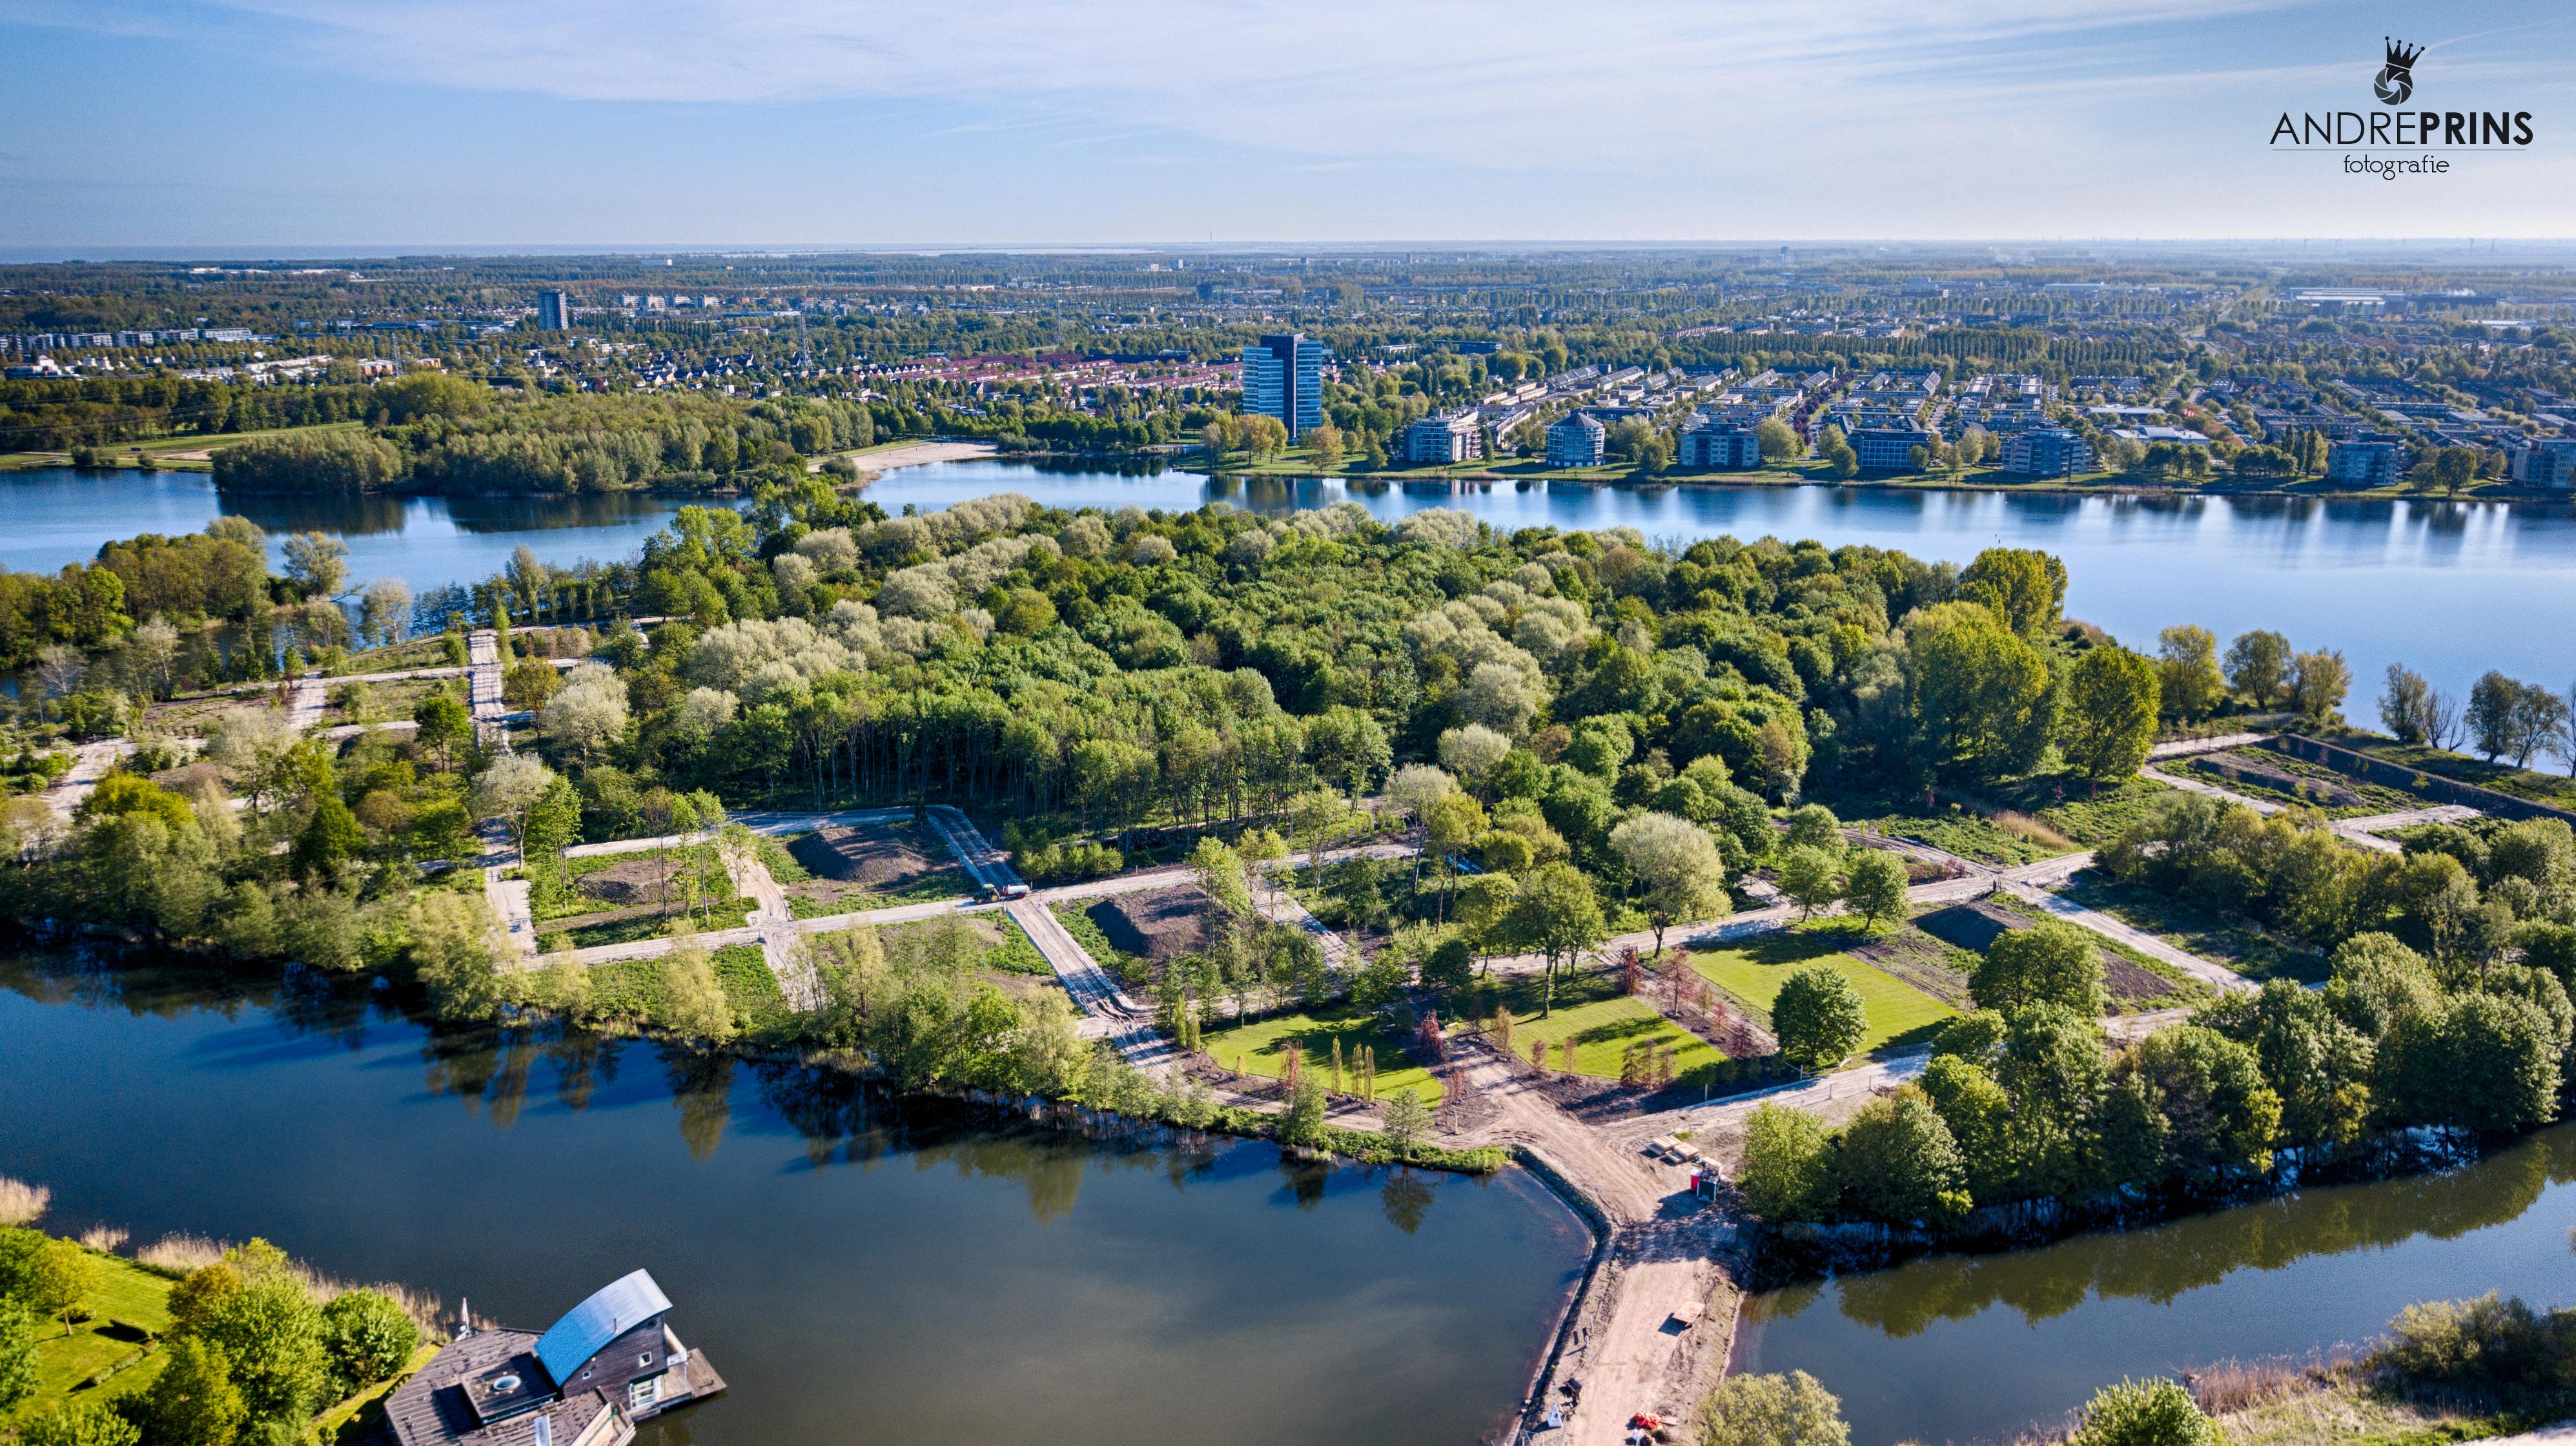 Floriade Almere mei 2018